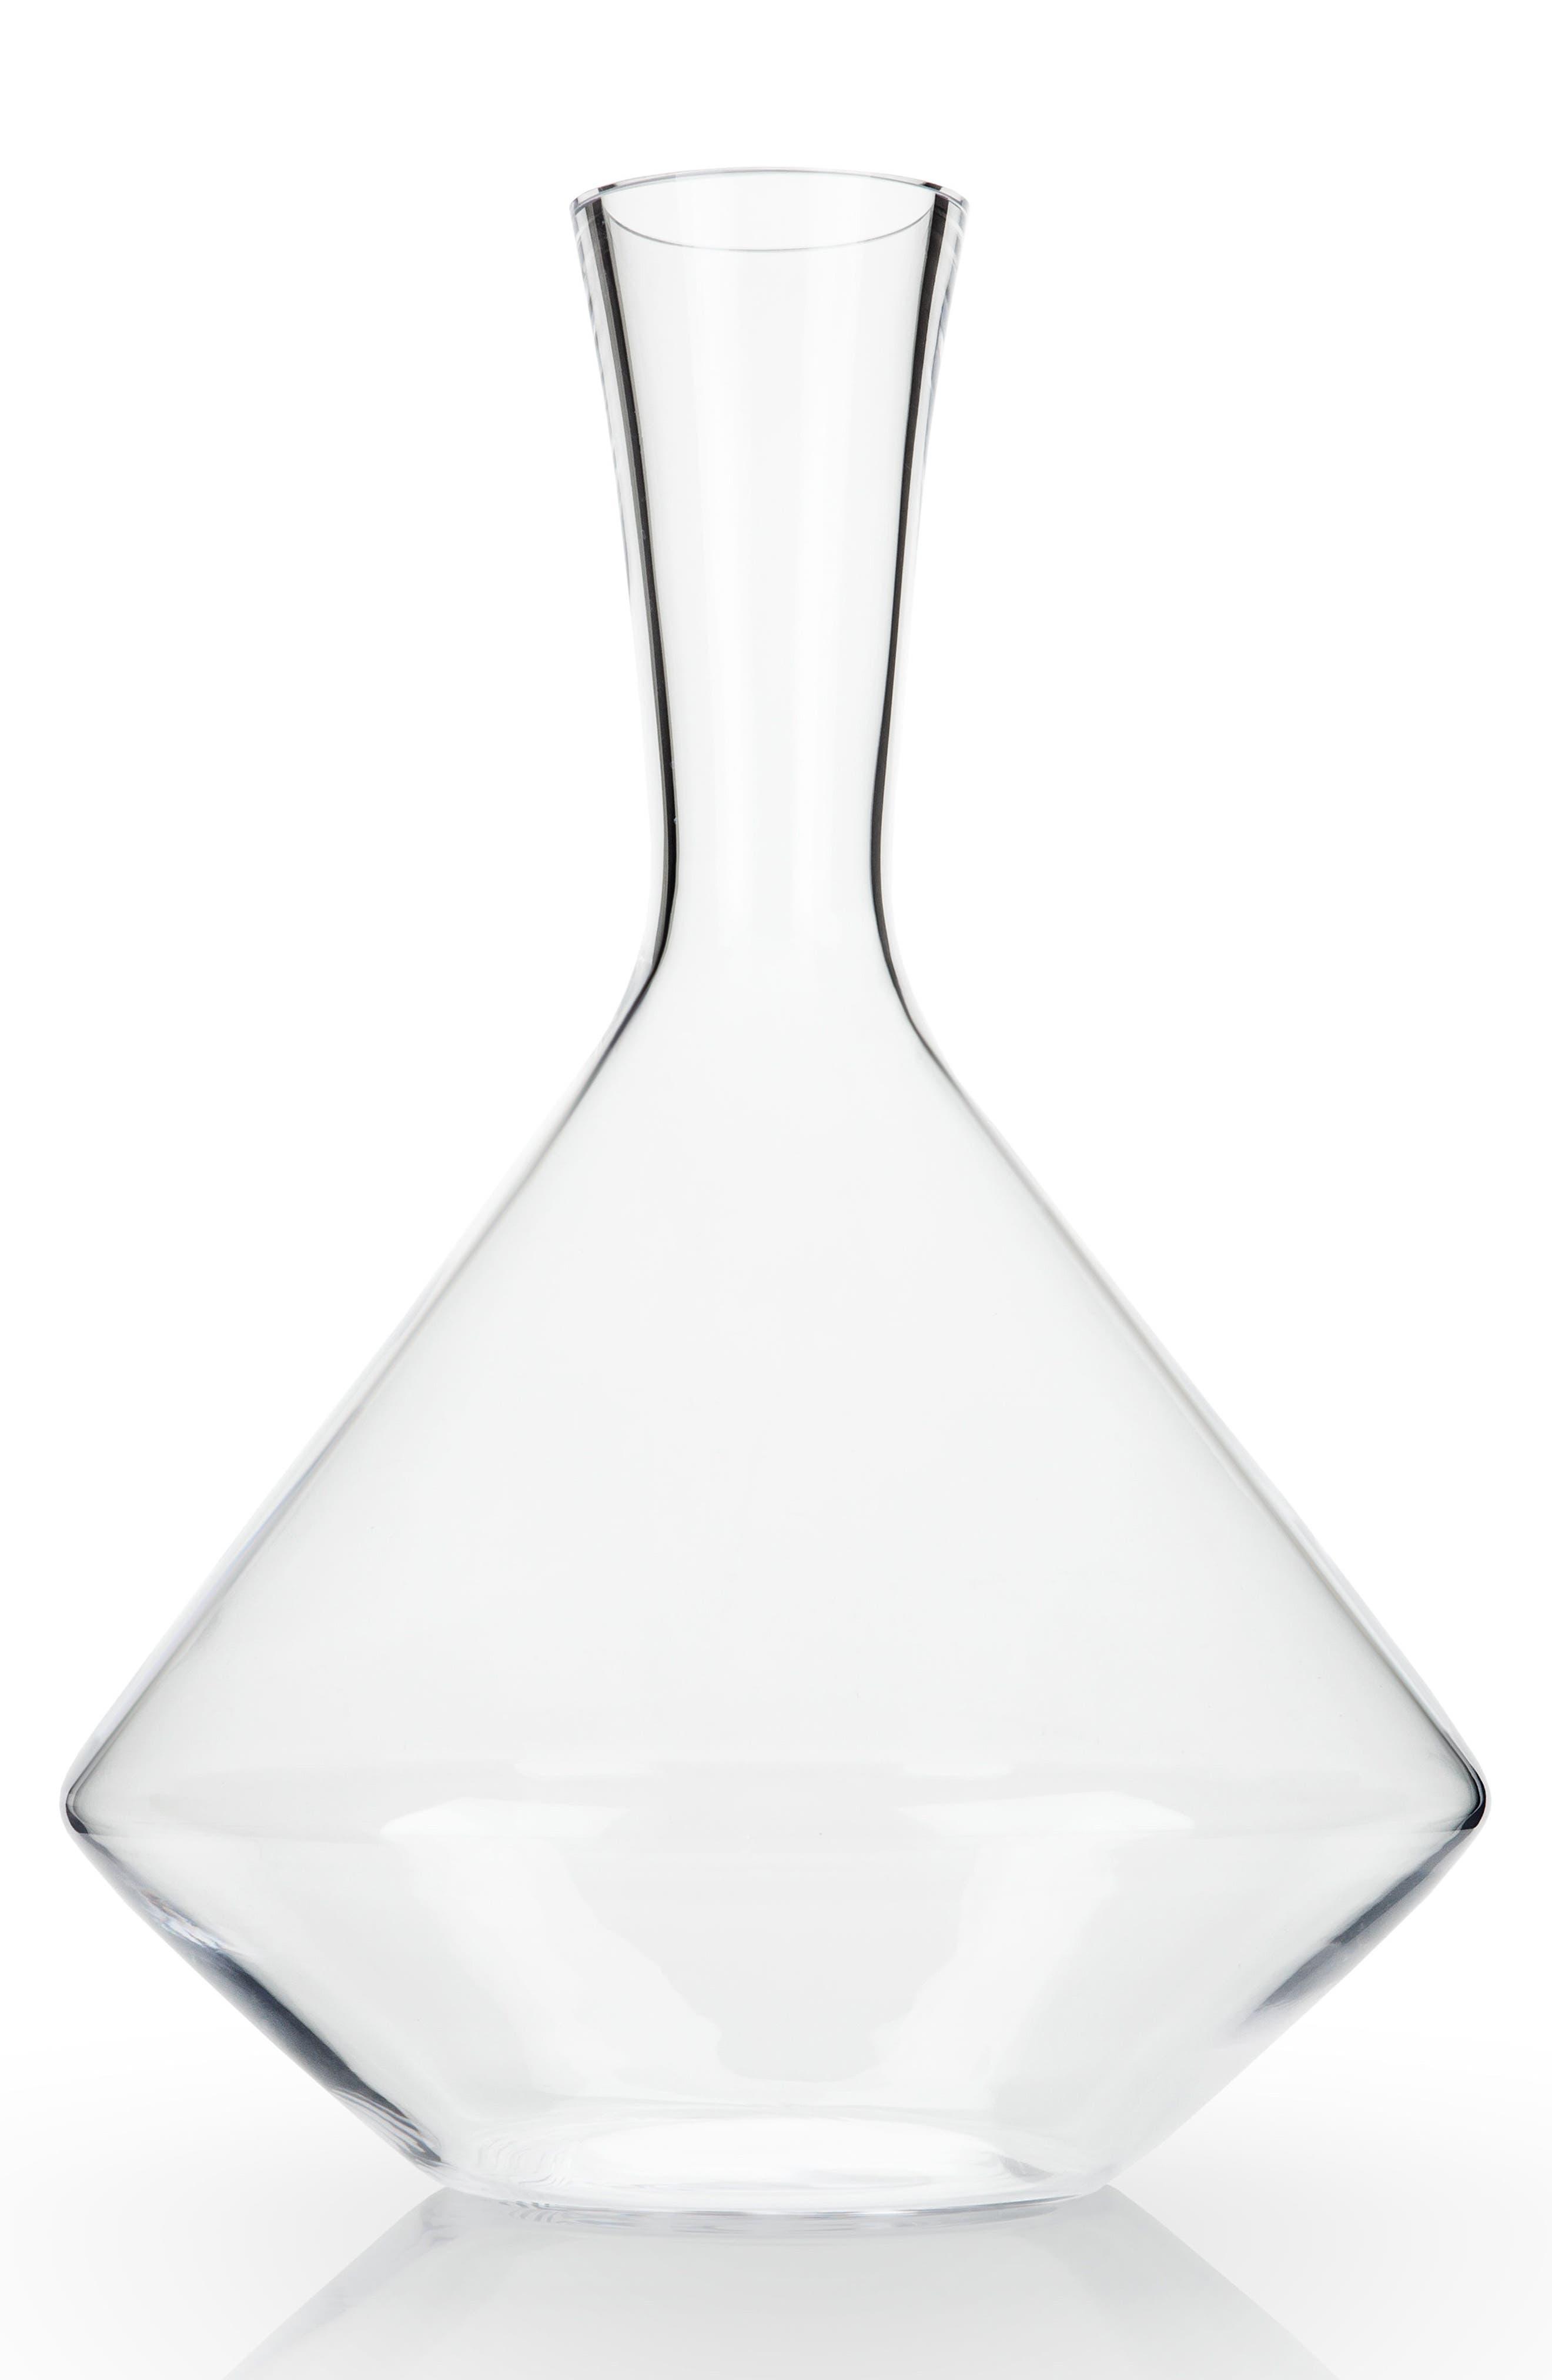 Raye Angle Decanter,                         Main,                         color, Clear